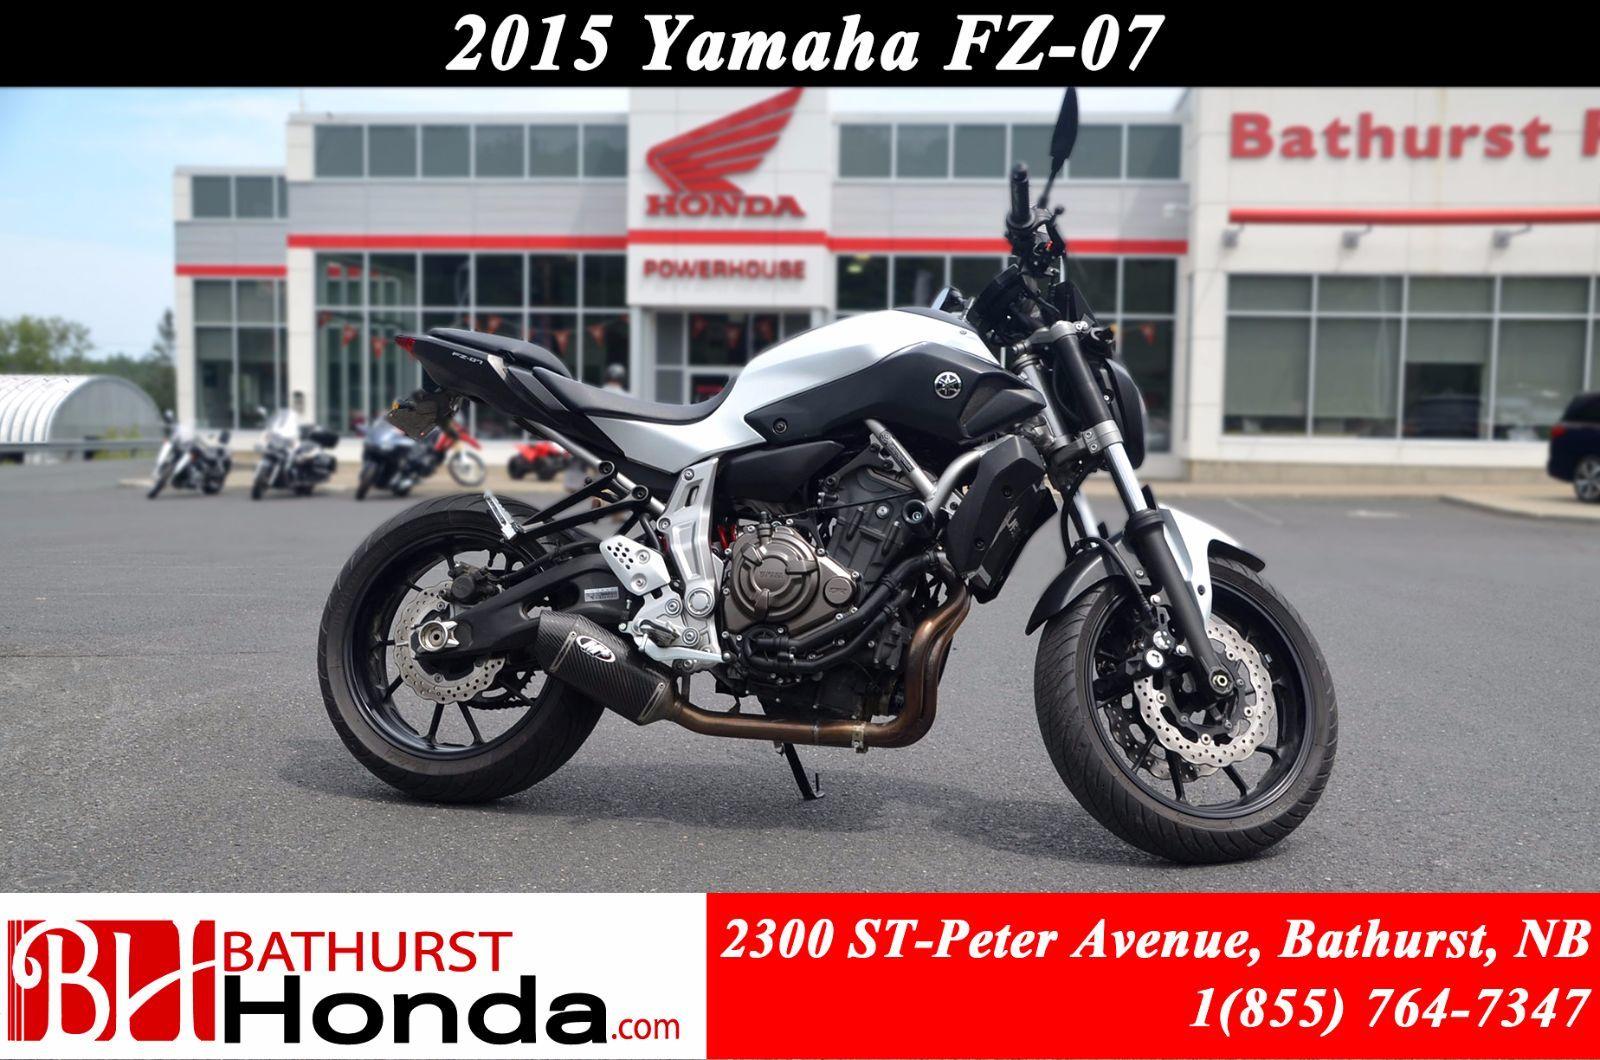 Yamaha fz 07 2015 d 39 occasion chez bathurst honda b4268c for Yamaha of sylacauga inventory